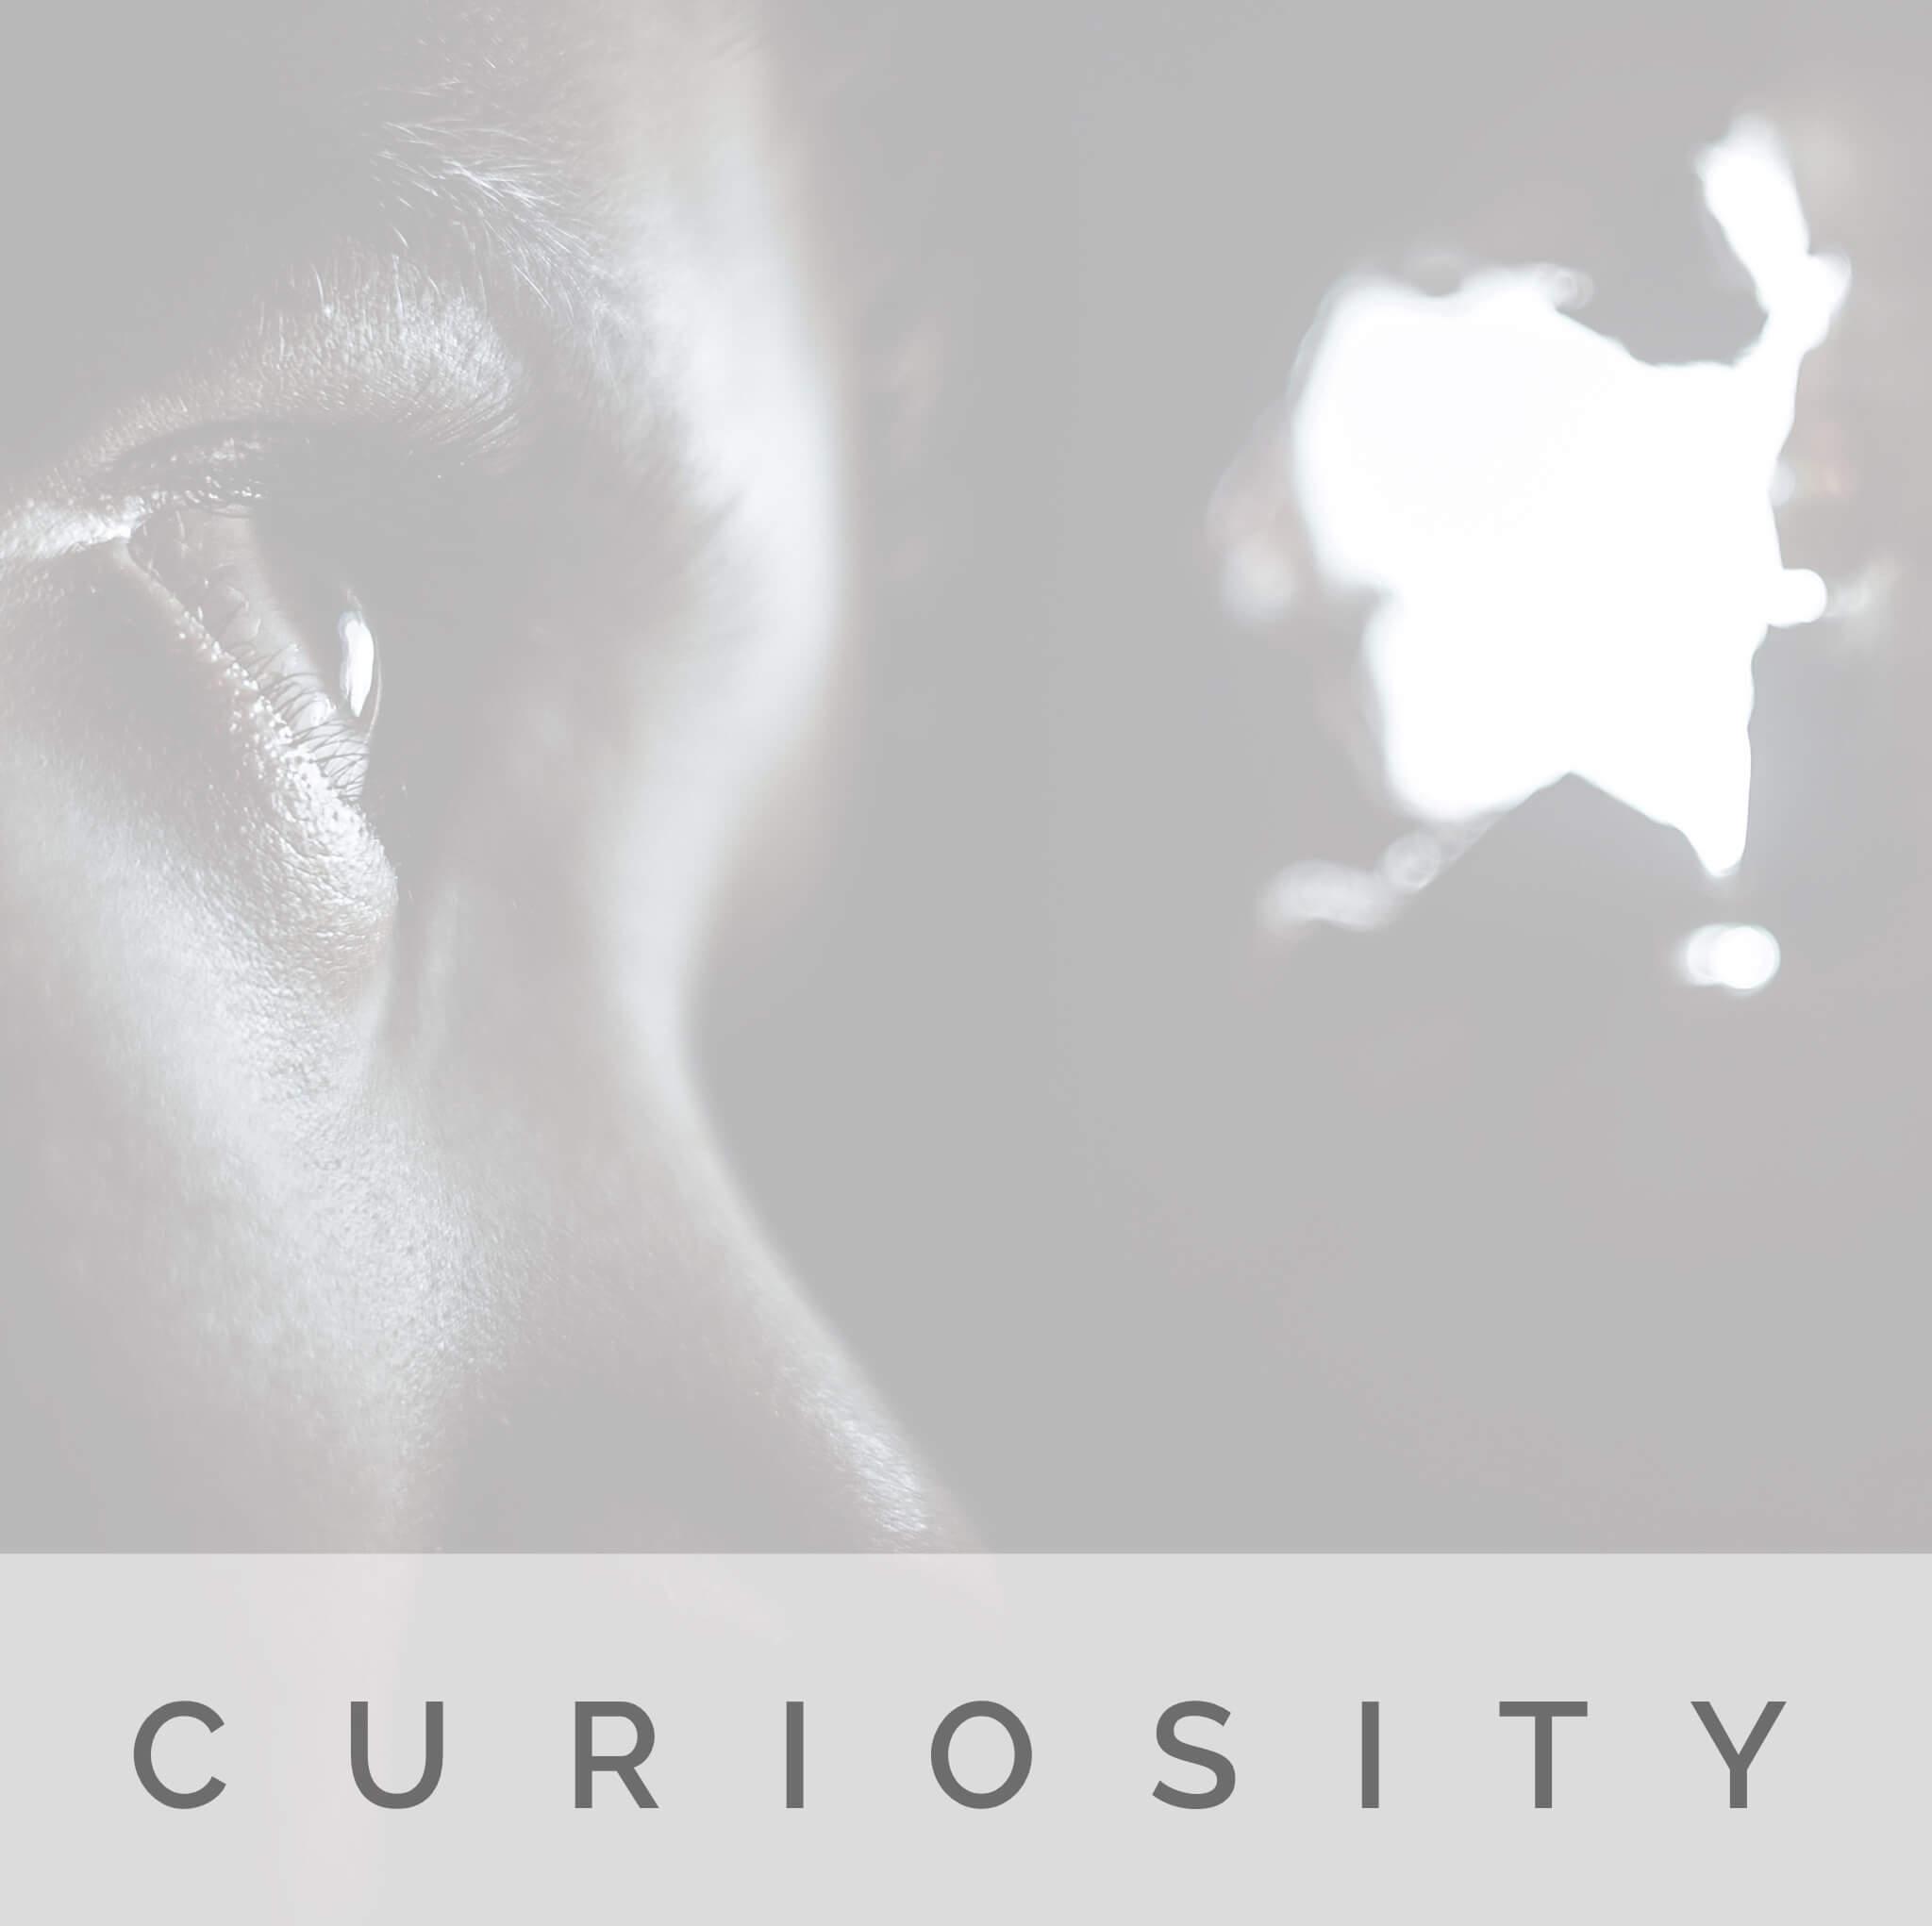 Curiosity   Strength   Signature Wisdom